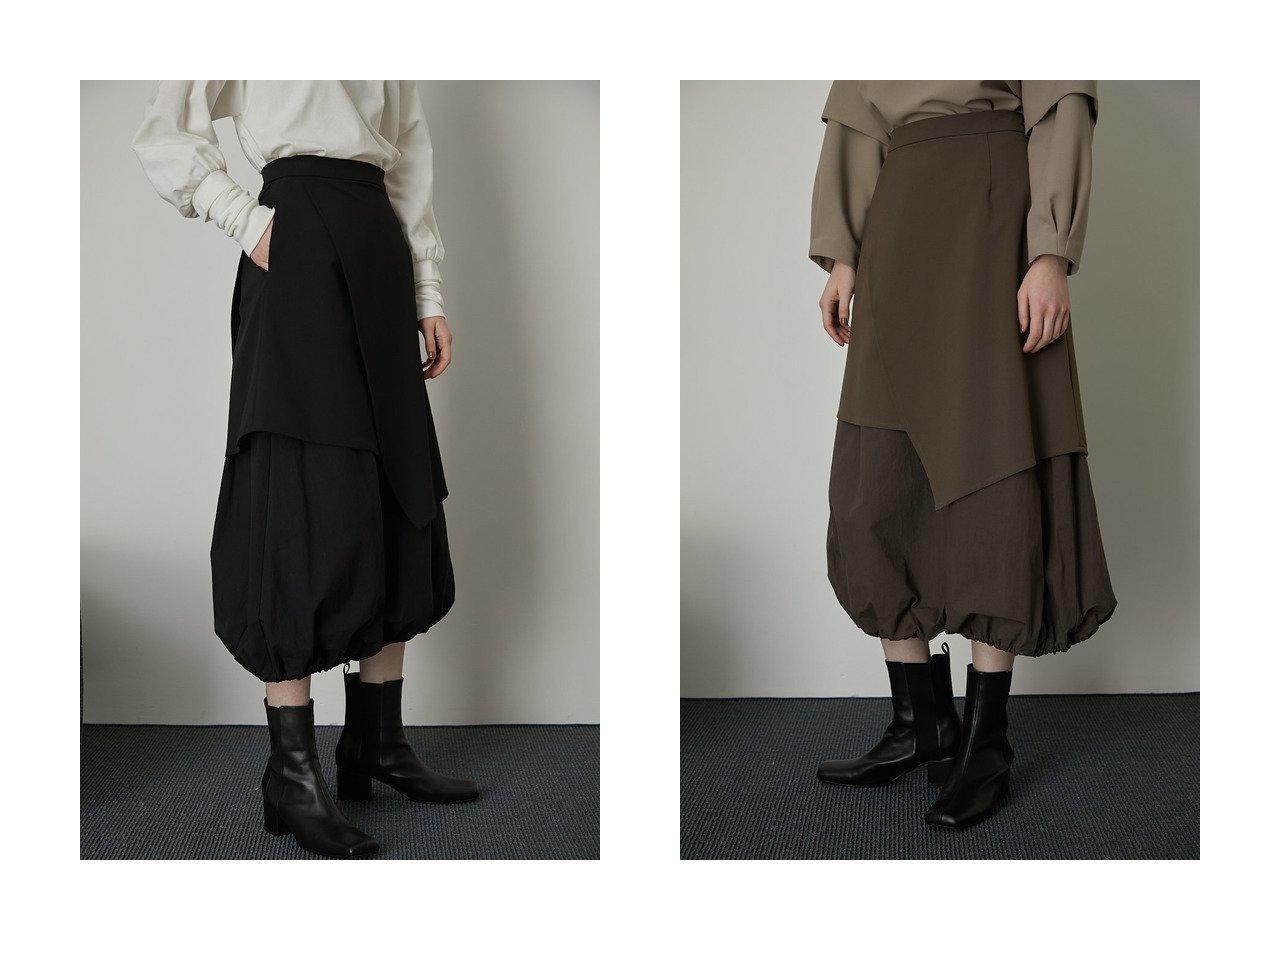 【RIM.ARK/リムアーク】のスカート RIM.ARKのおすすめ!人気、トレンド・レディースファッションの通販 おすすめで人気の流行・トレンド、ファッションの通販商品 メンズファッション・キッズファッション・インテリア・家具・レディースファッション・服の通販 founy(ファニー) https://founy.com/ ファッション Fashion レディースファッション WOMEN スカート Skirt ロングスカート Long Skirt 2021年 2021 2021 春夏 S/S SS Spring/Summer 2021 S/S 春夏 SS Spring/Summer ドッキング ドローストリング マキシ ロング 切替 春 Spring |ID:crp329100000018760